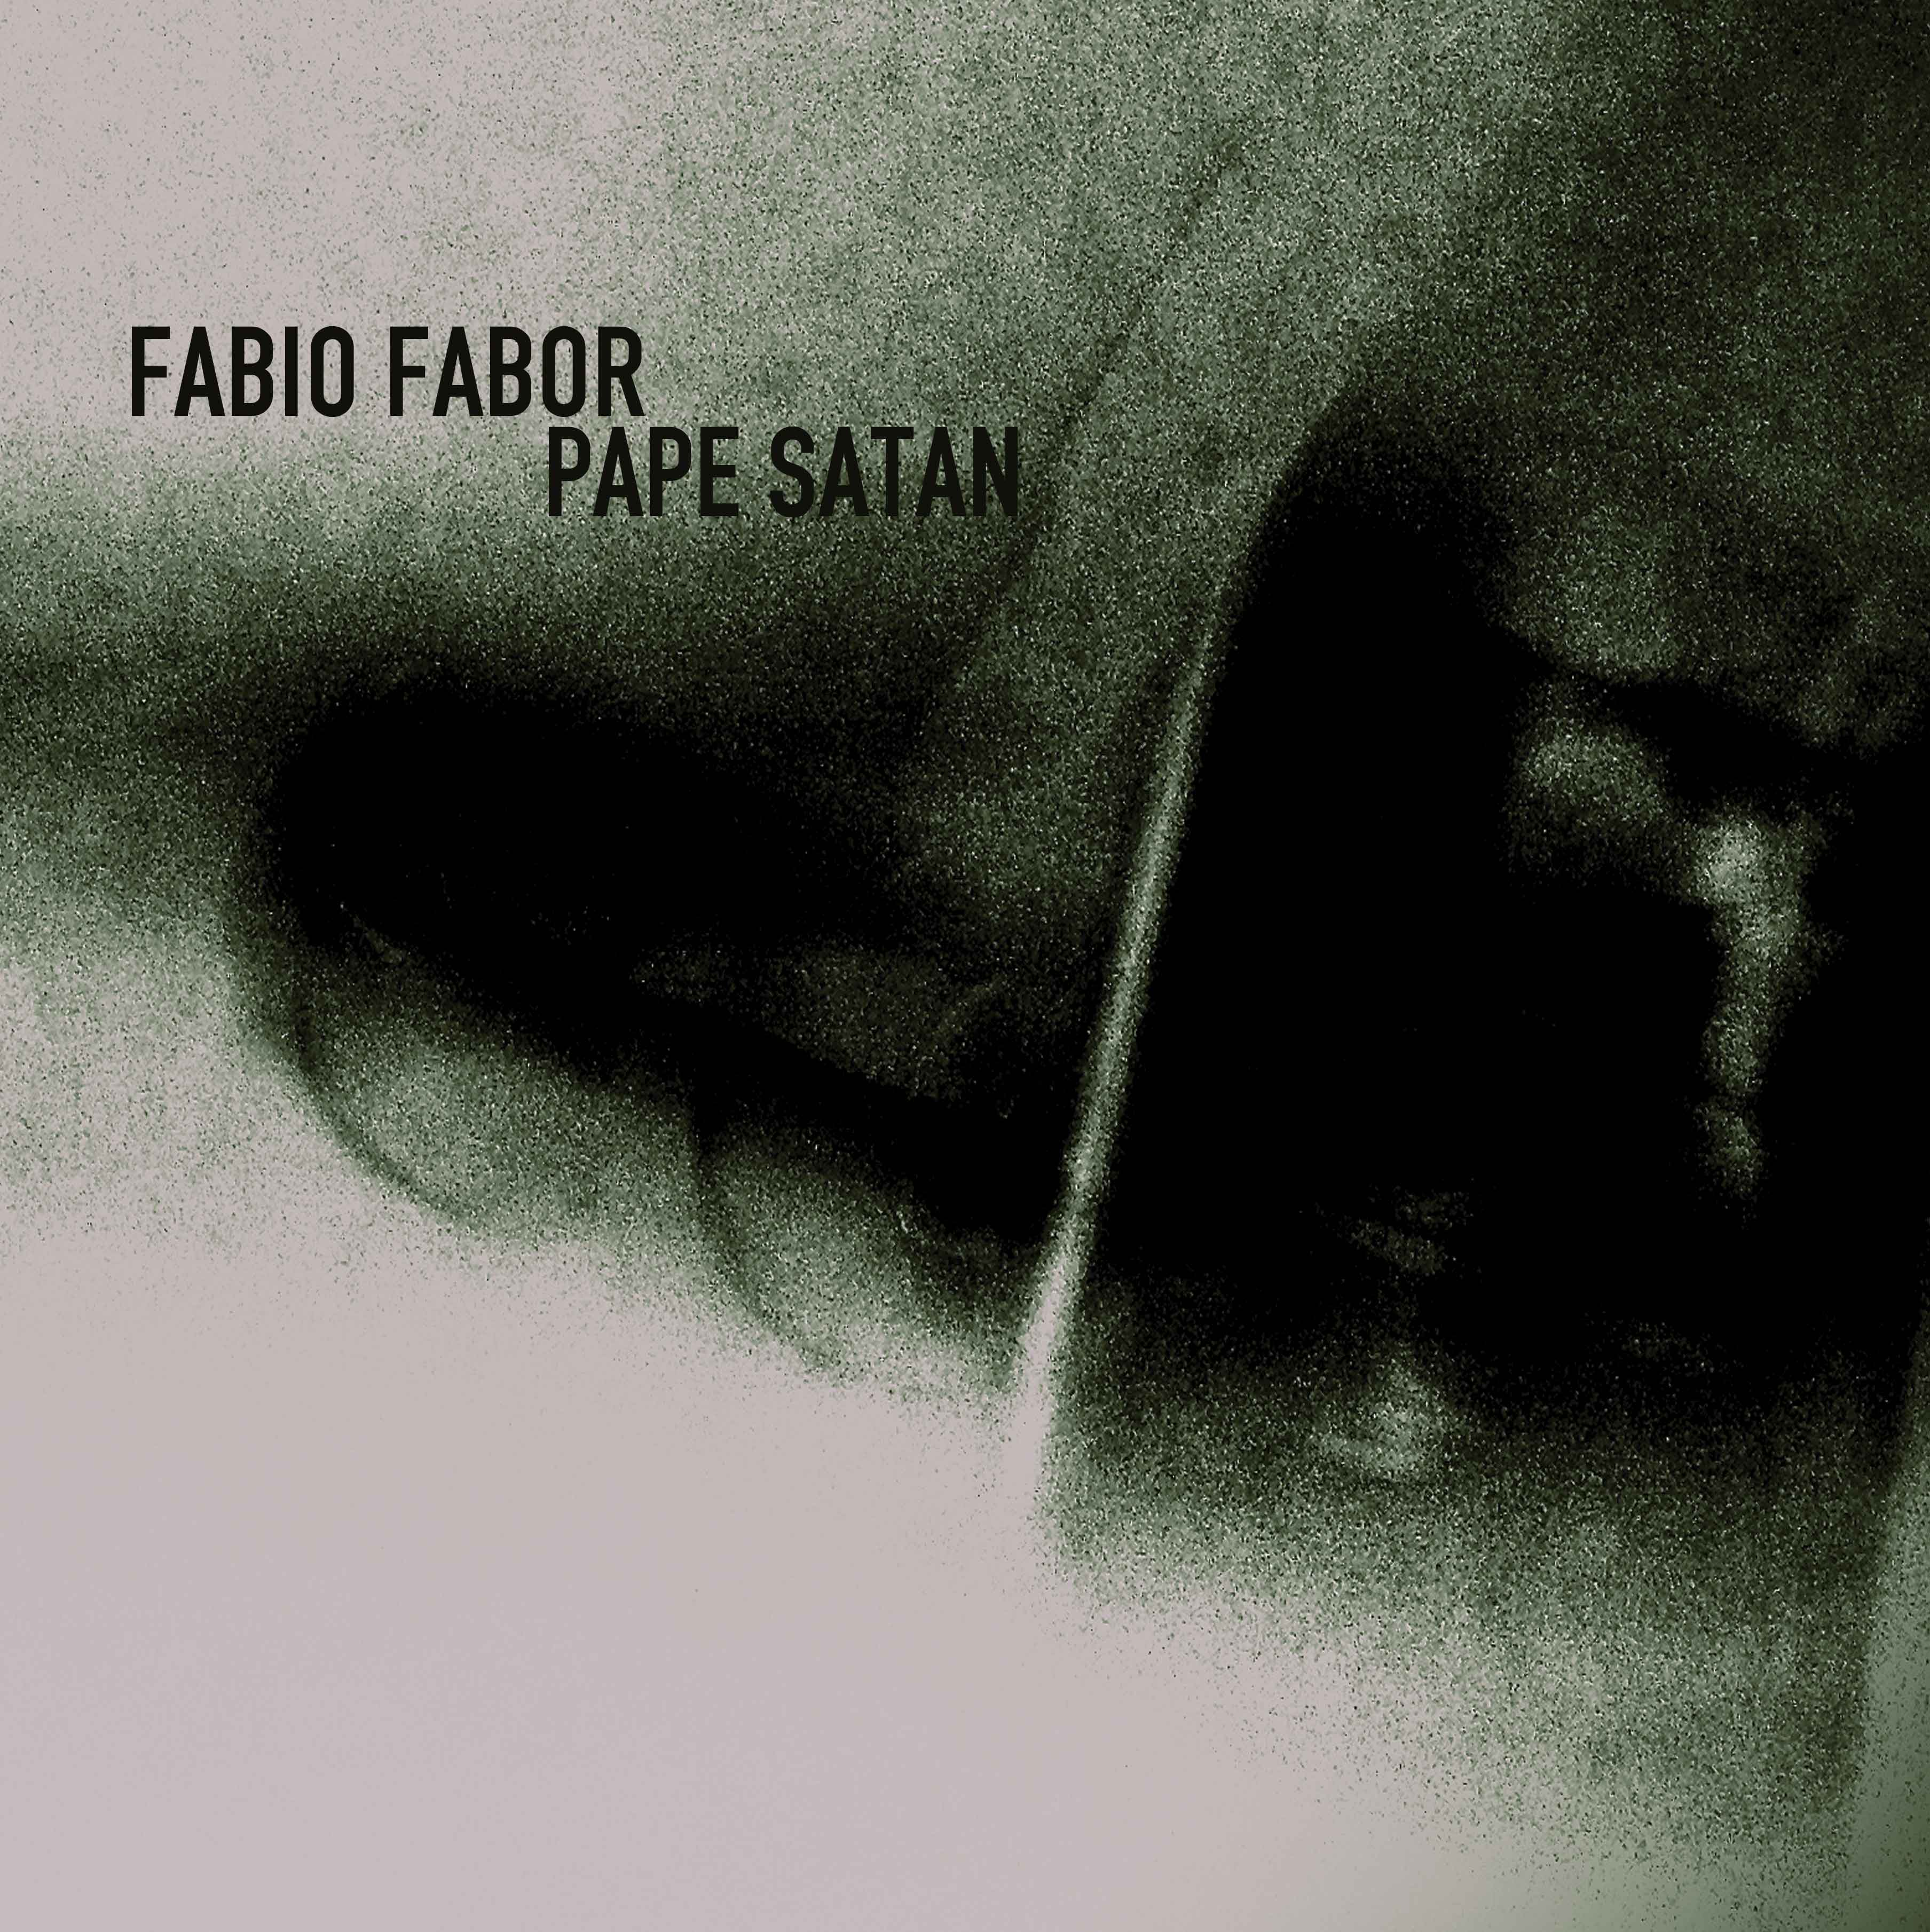 Fabio Fabor Fabor - Giancarlo Barigozzi Barigozzi Anxious - Dramatic - Industrial